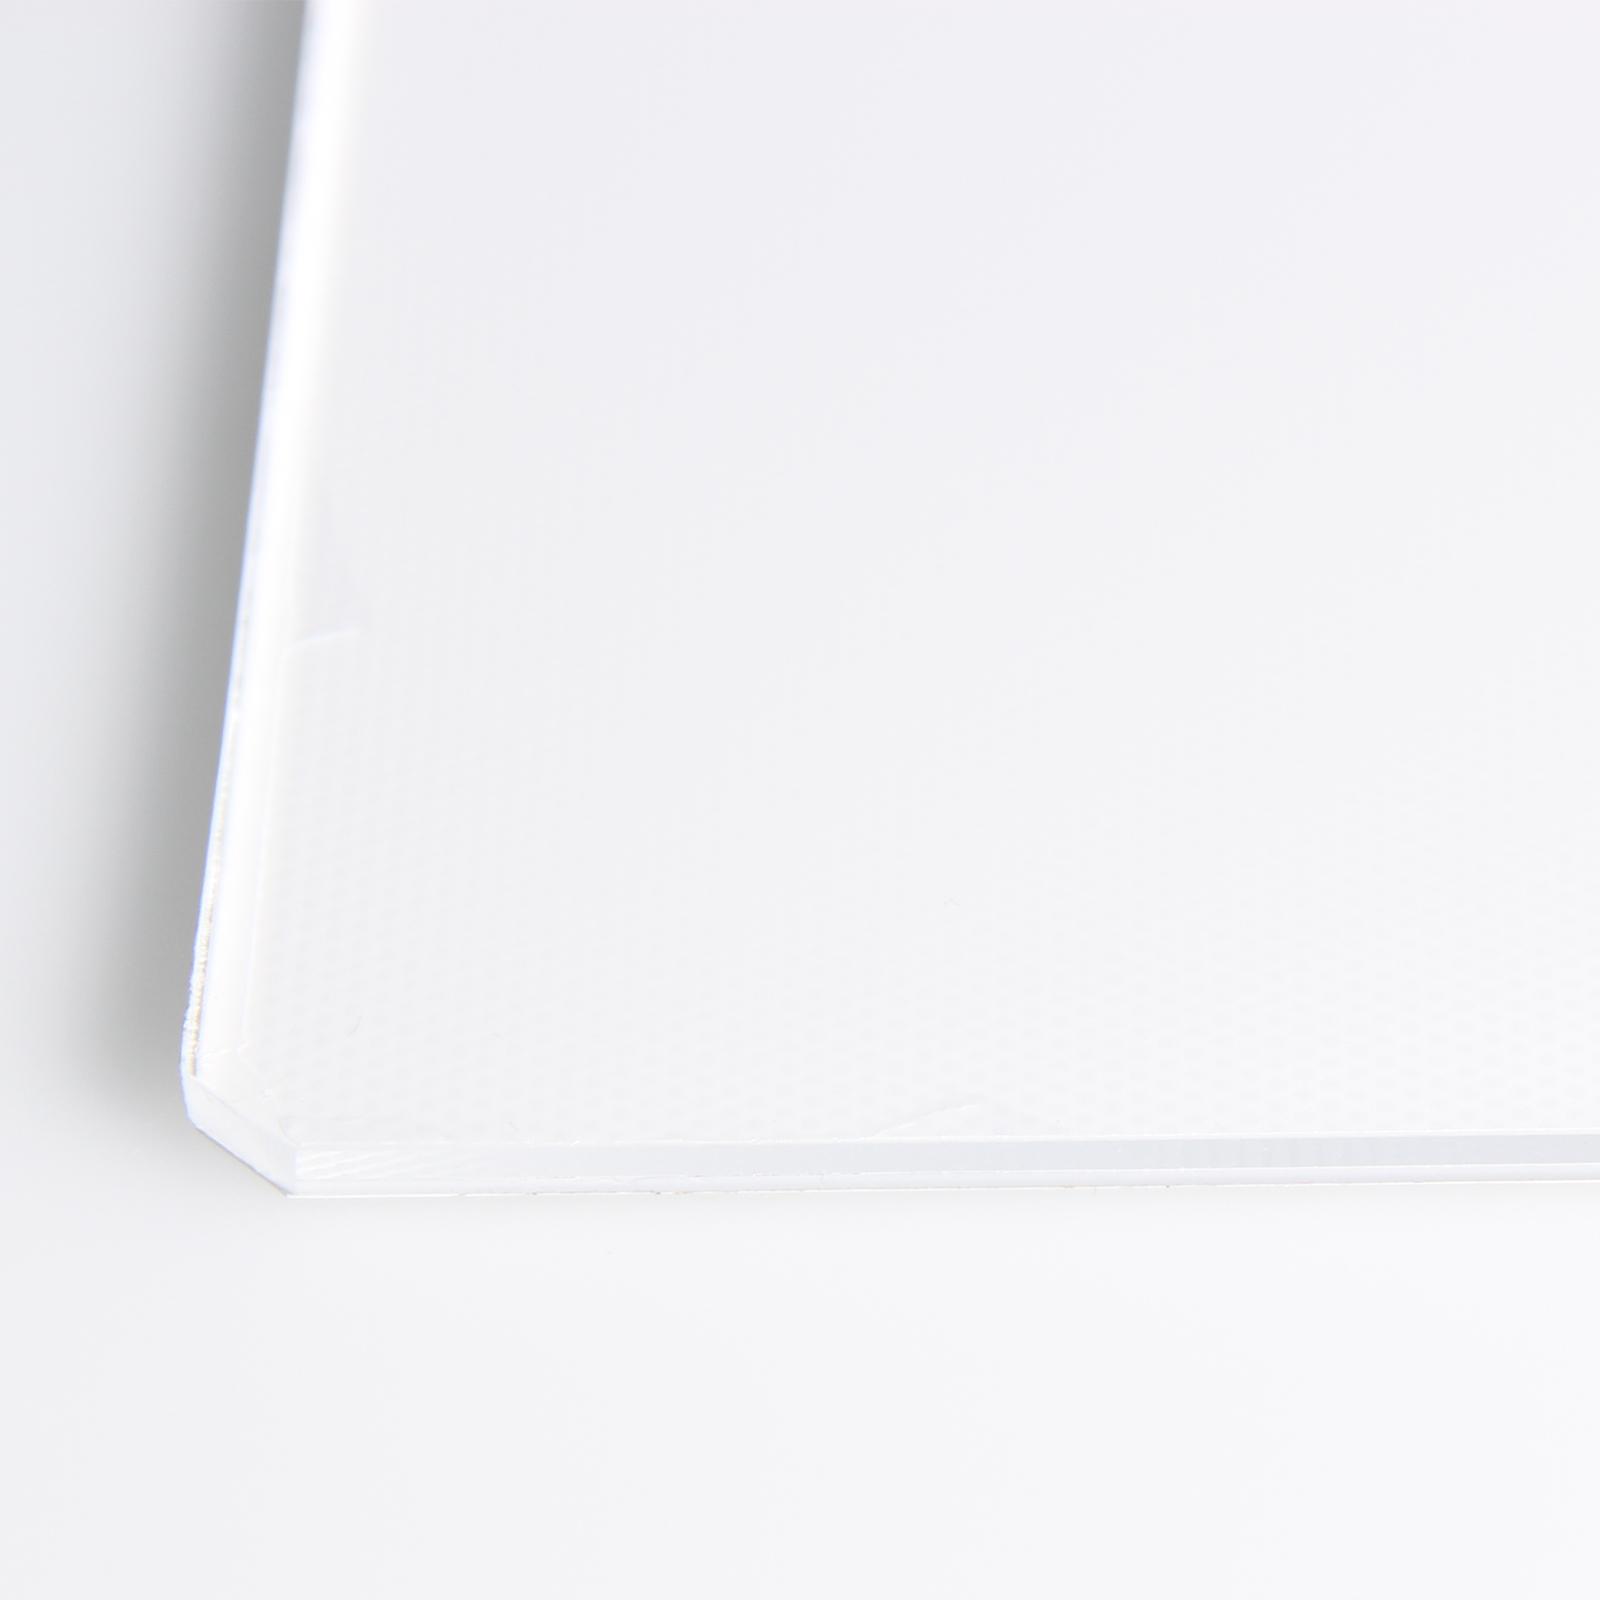 Komplett Led Panel Lampe @JI35 – Startupjobsfa